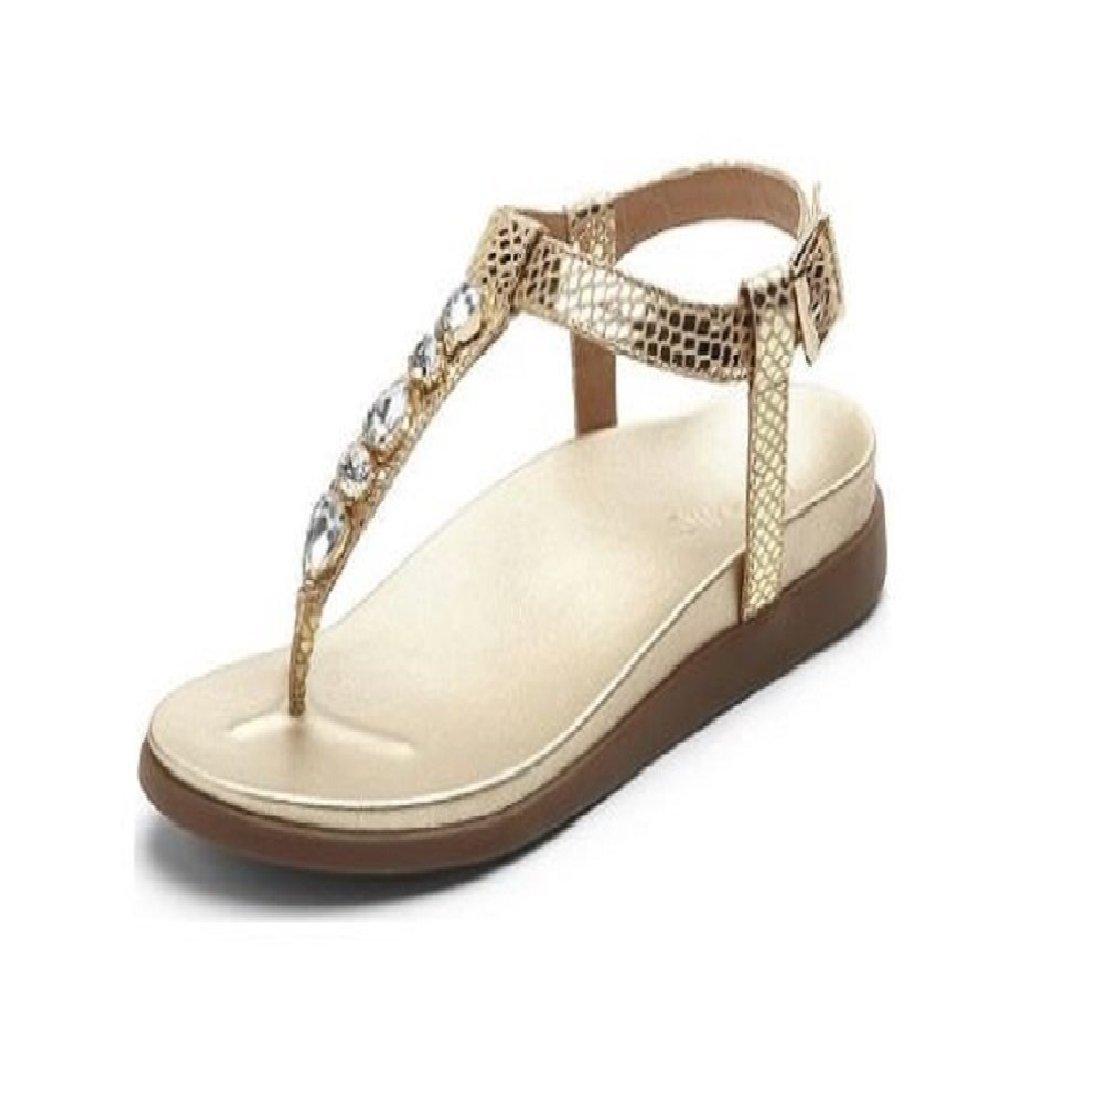 Vionic Palm Boca- Womens Sandal Gold Snake - 8 Medium